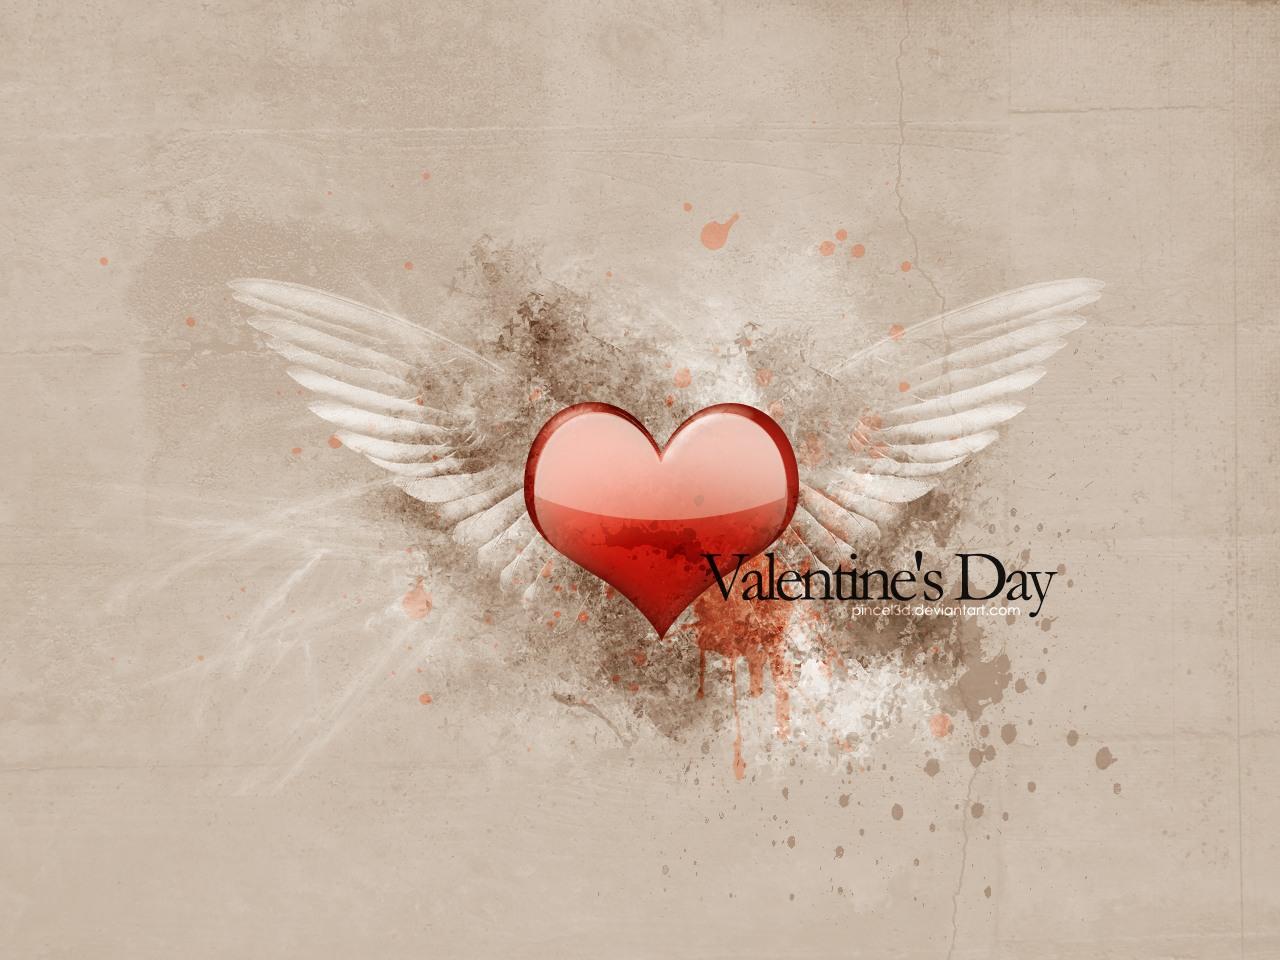 http://2.bp.blogspot.com/-Mlkq3dpi_ZQ/ULGe_1G1D9I/AAAAAAAARaI/84tnDKFXlO0/s1600/valentine-day-wallpaper.jpg